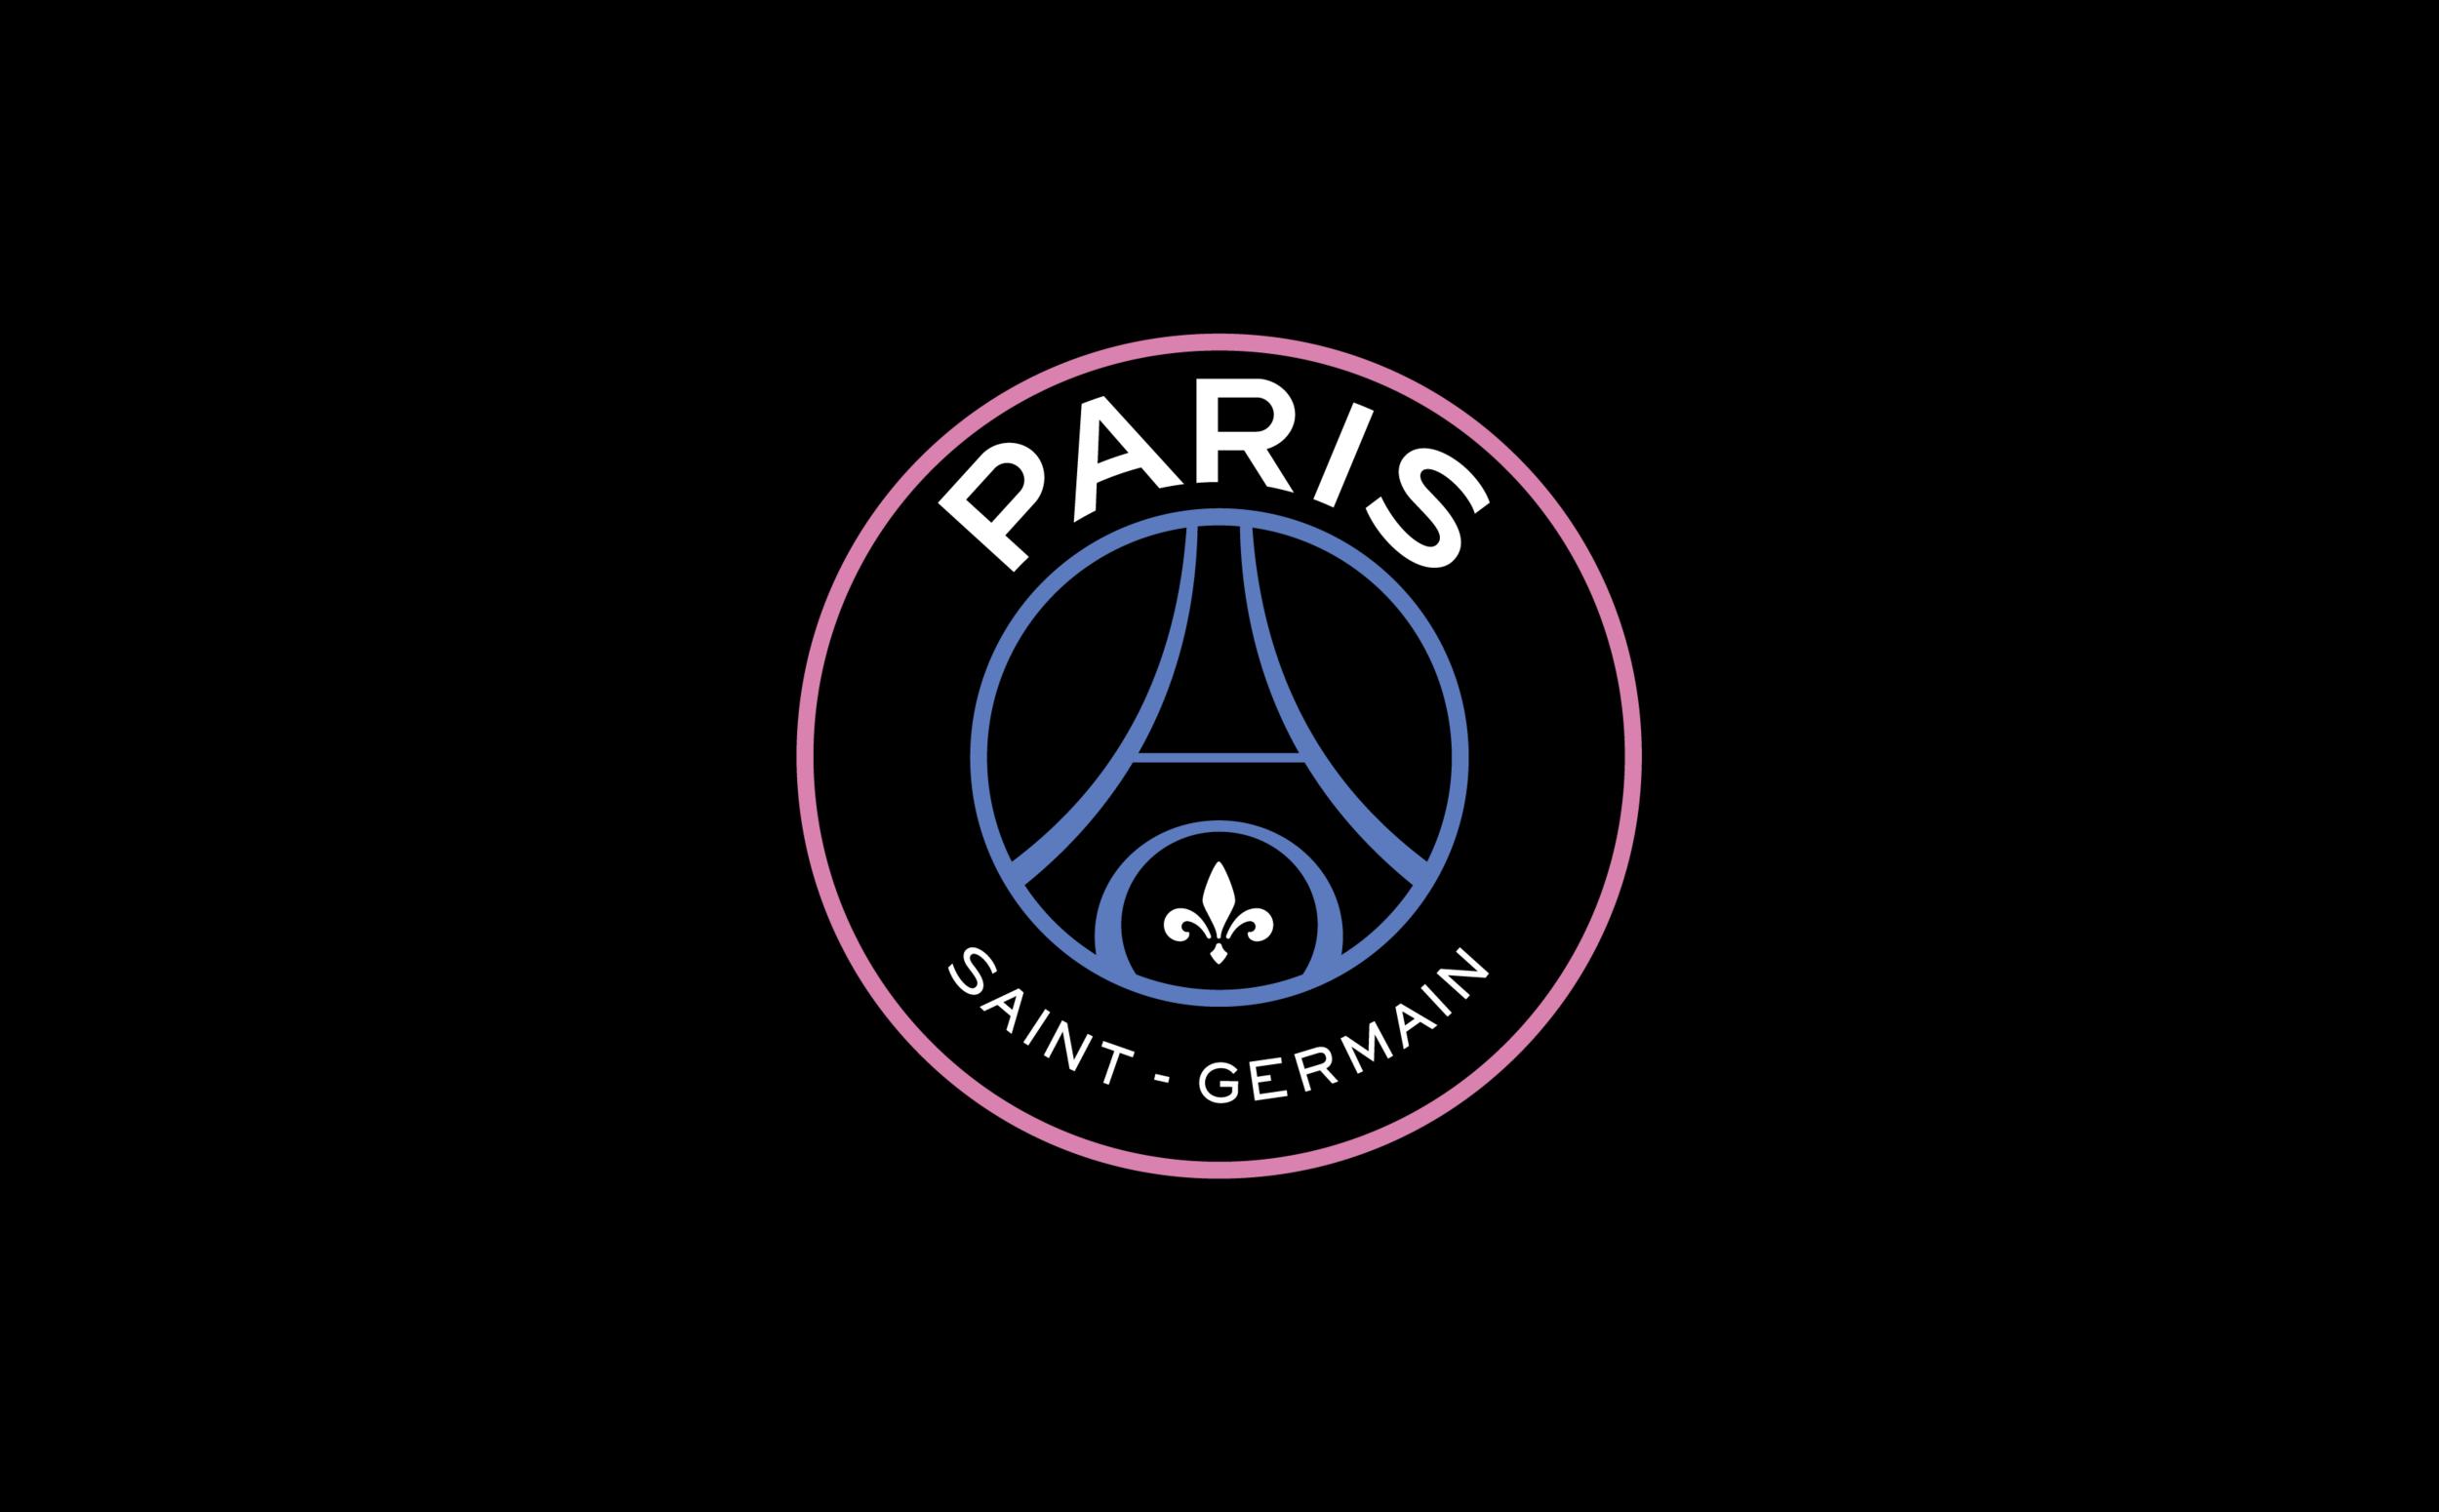 paris saint germain the residence